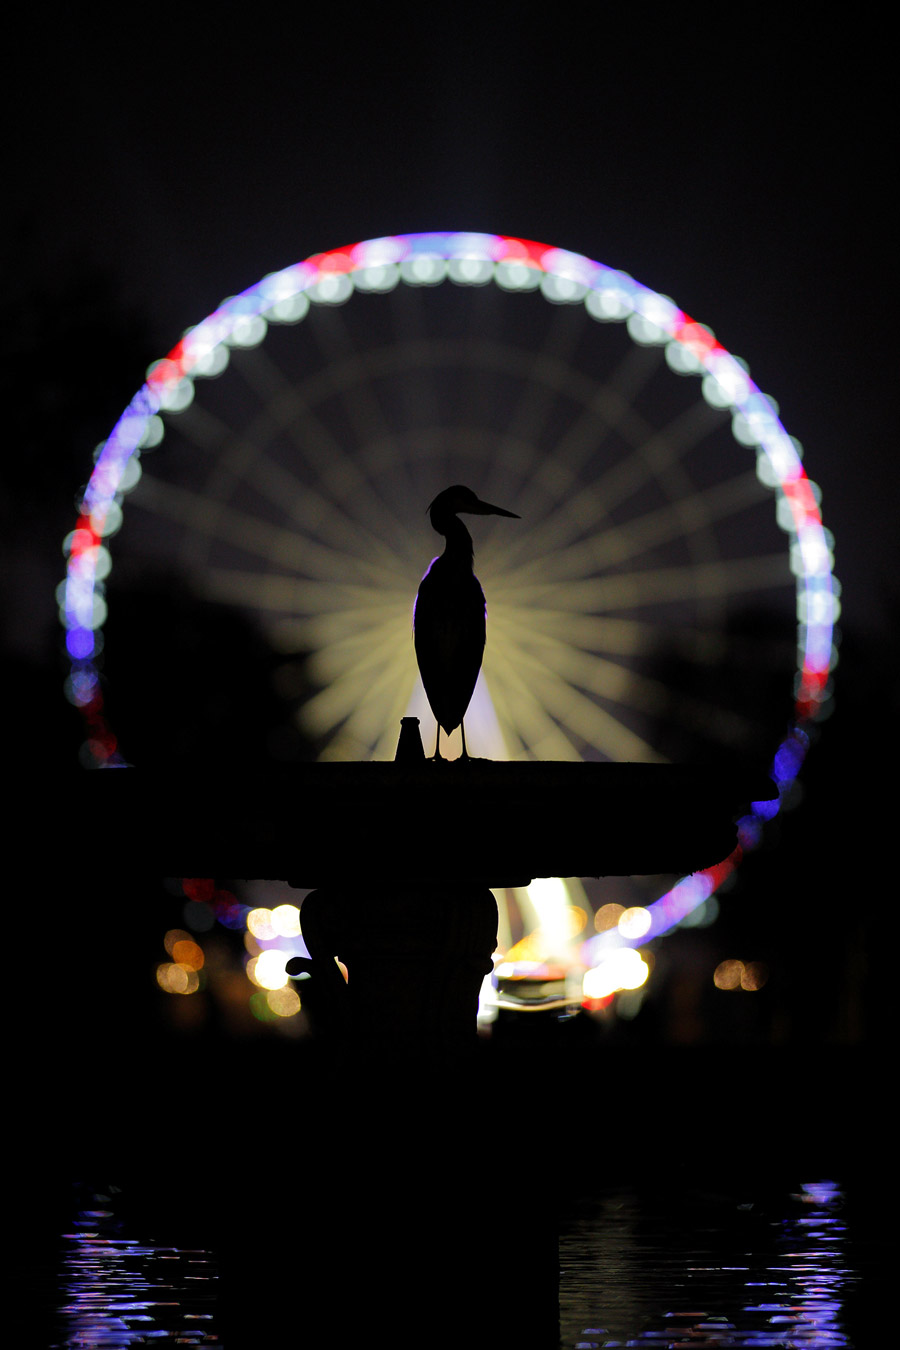 The Peacock of Paris, © Nathan Livartowski, Winner, Golden Turtle Photo Contest